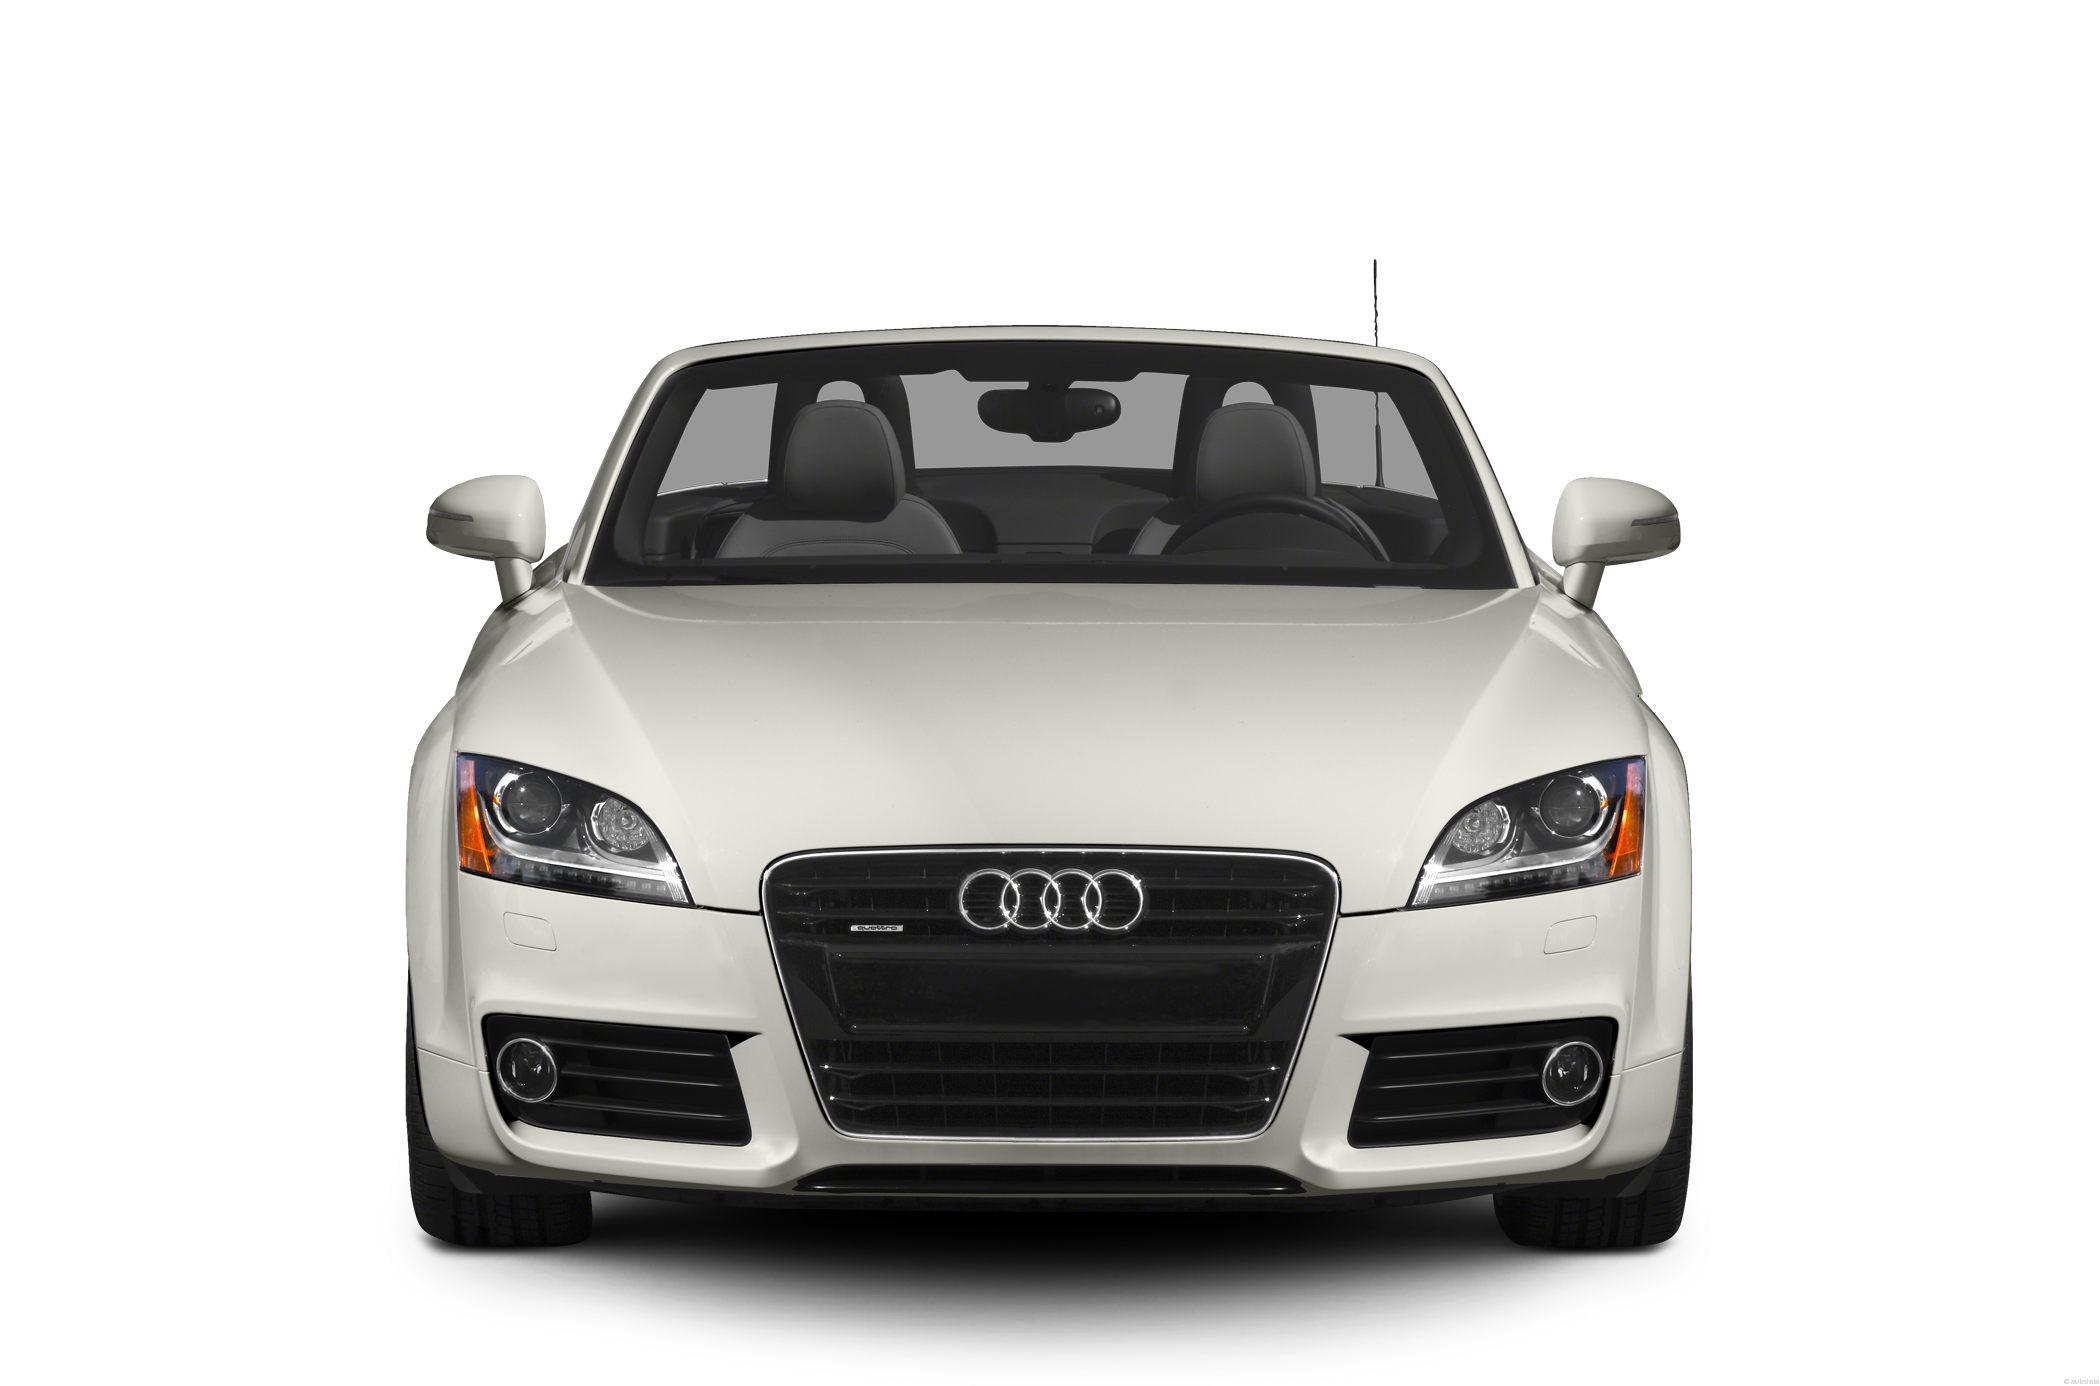 Audi car front png #32716.